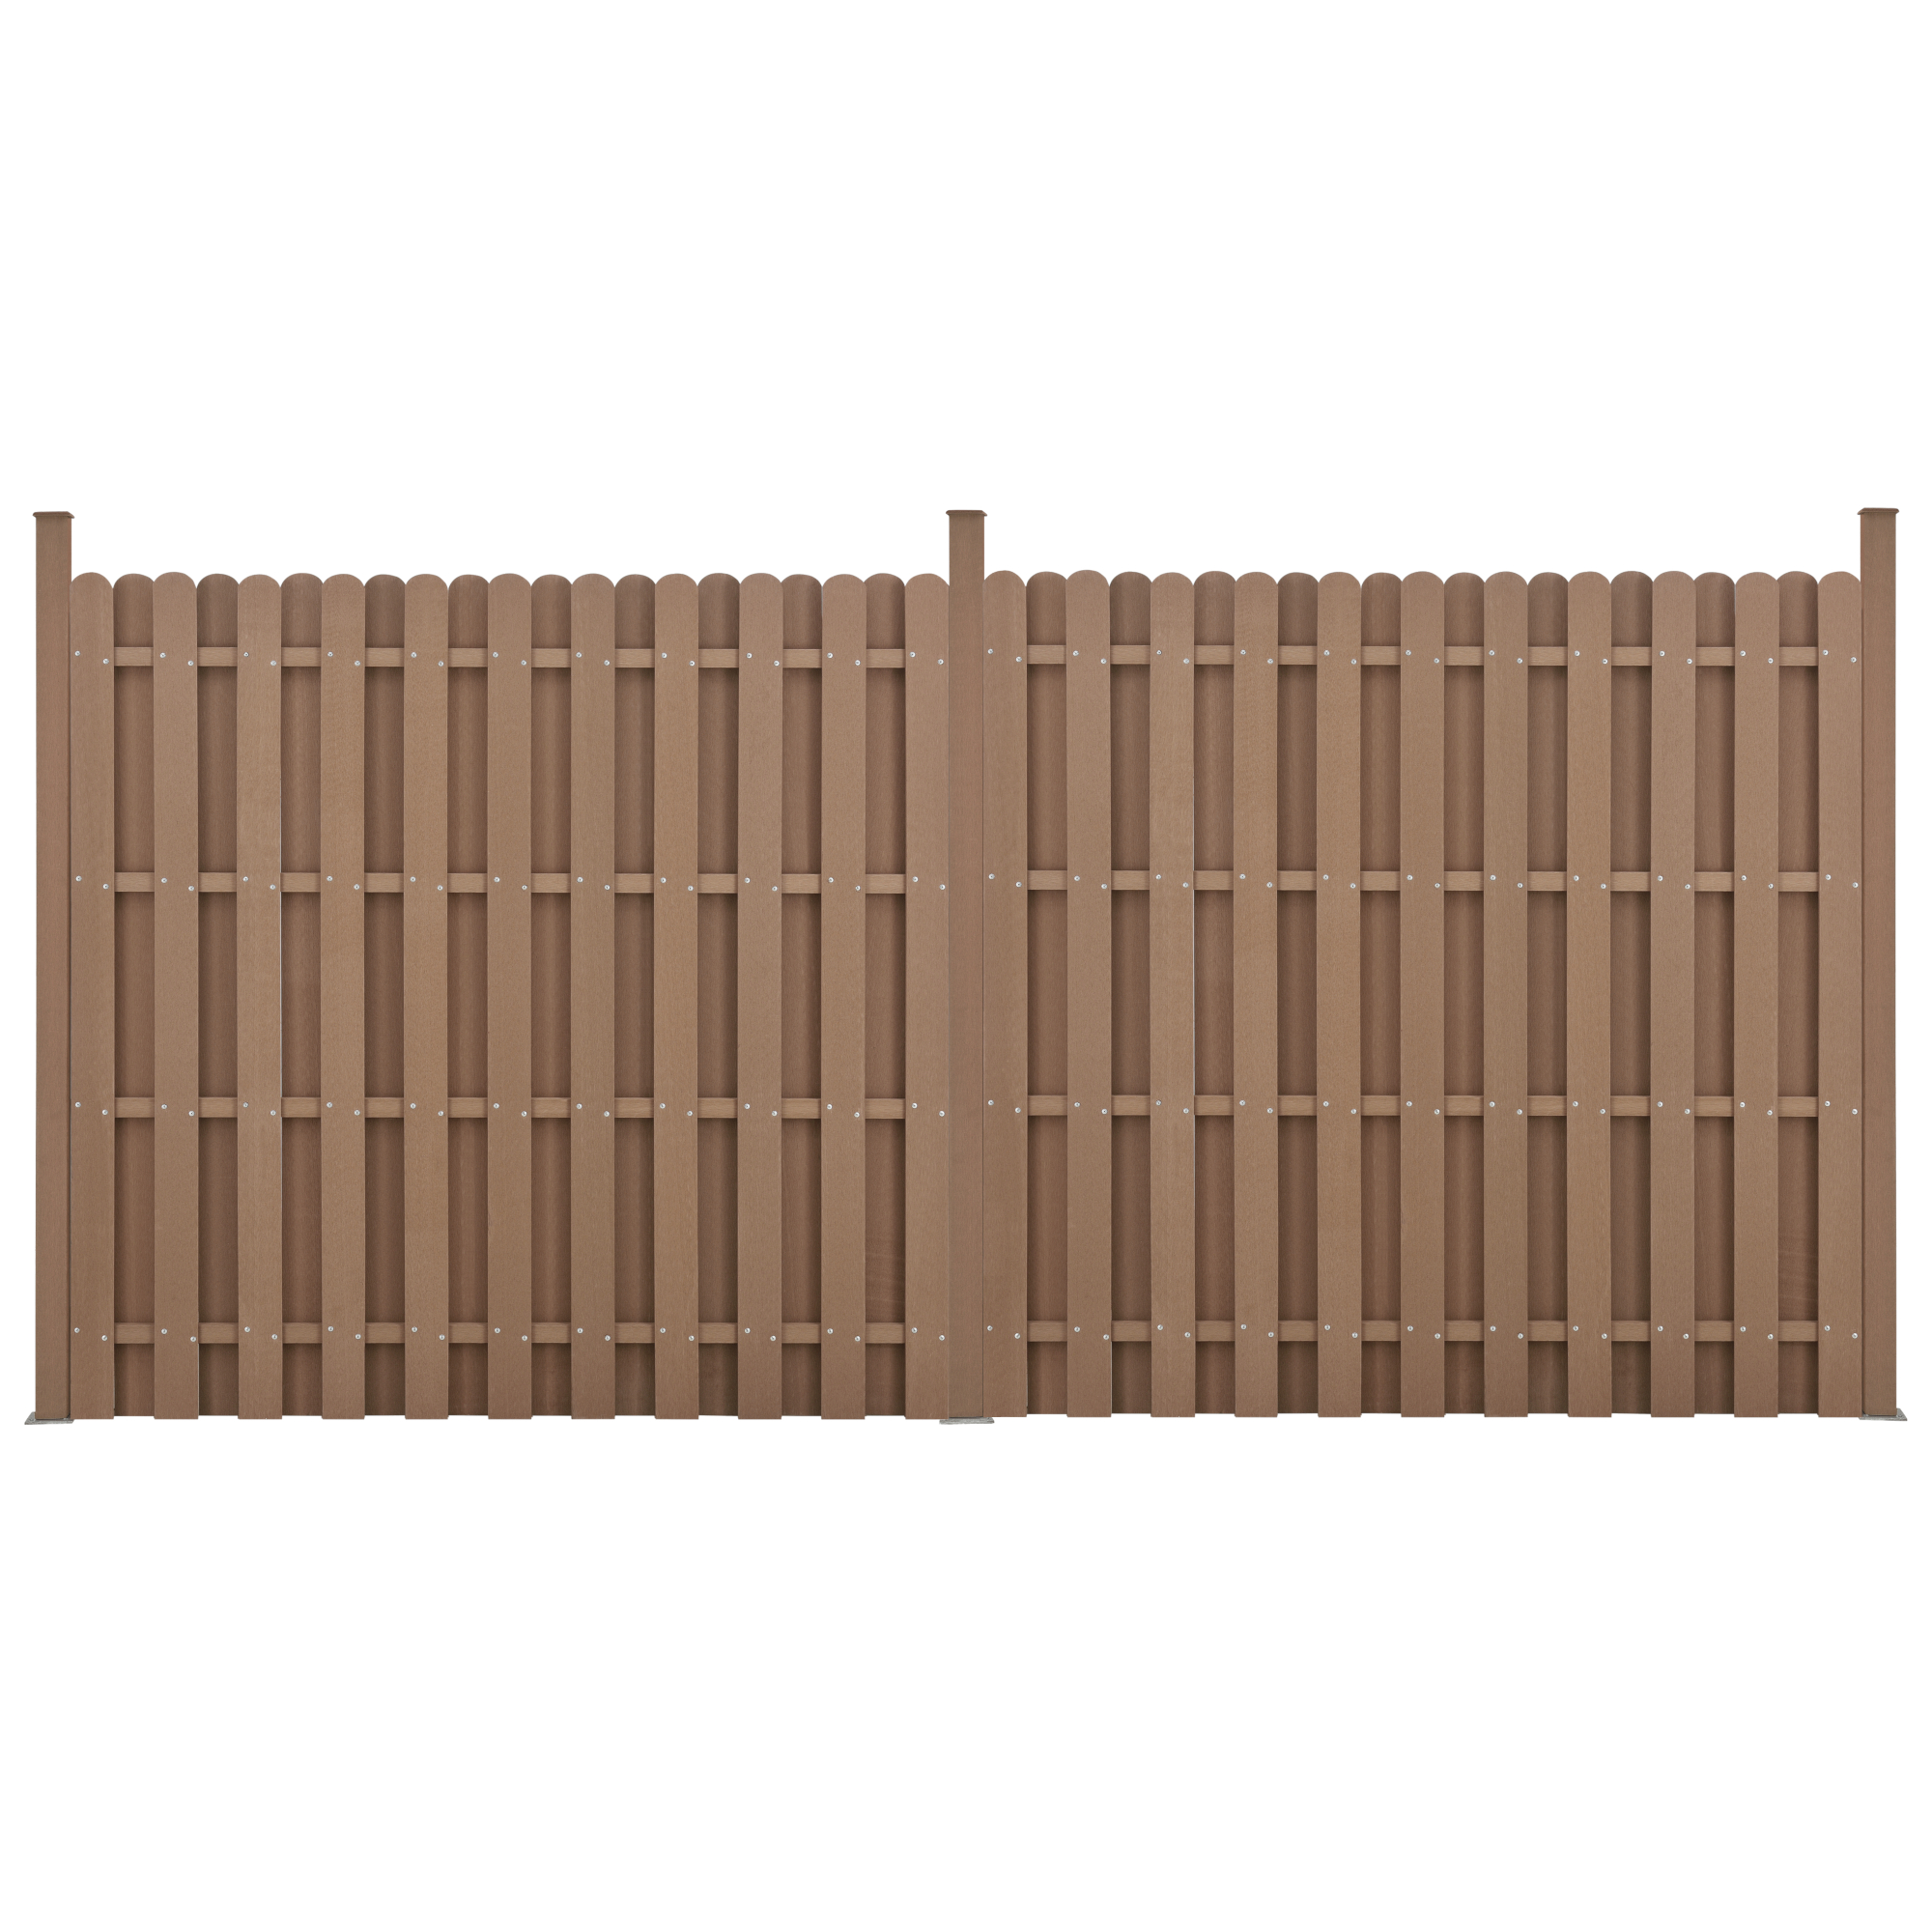 Neu Holz Wpc Gartenzaun Sichtschutz Windschutz Lamellenzaun Zaun